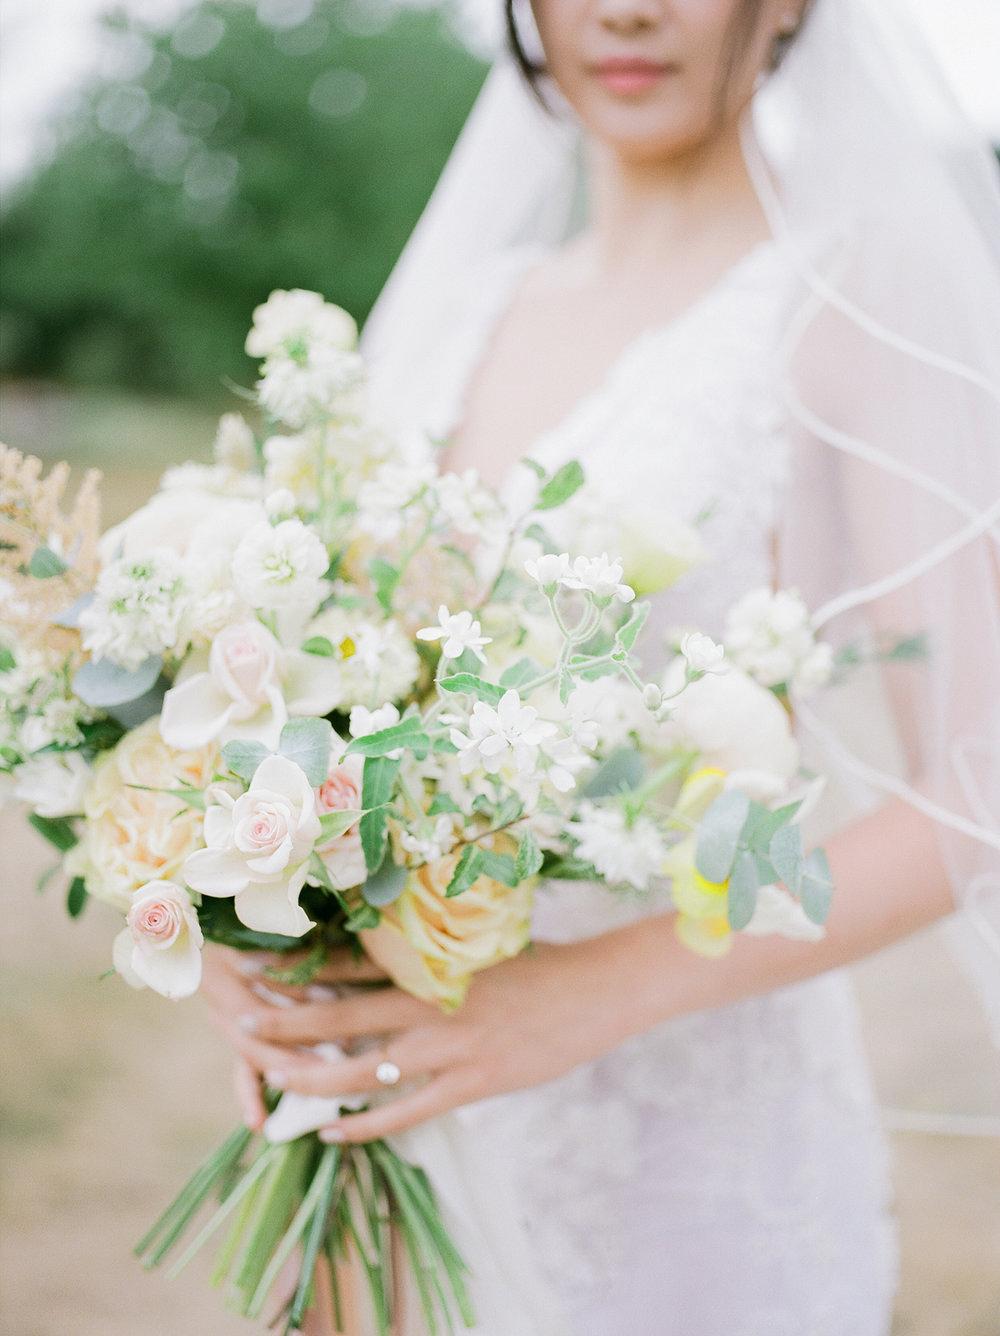 jennifer-xu-photography-vineyard-bride-swish-list-rosewod-eatstes-winery-beamsville-wedding-editorial-36.jpg